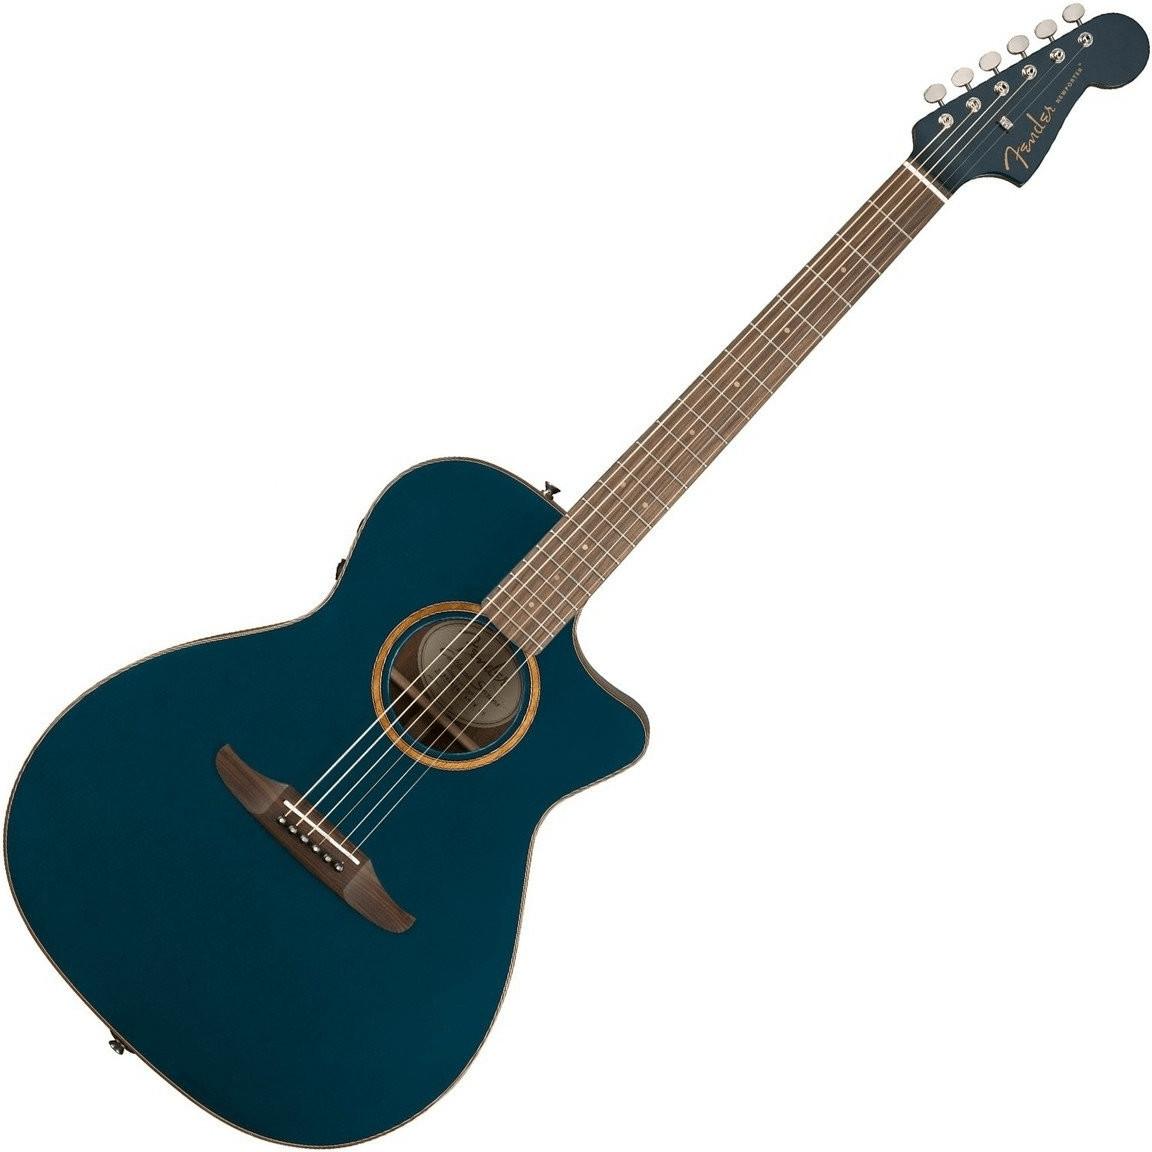 Fender Newporter Classic 2018 Cosmic Turquoise